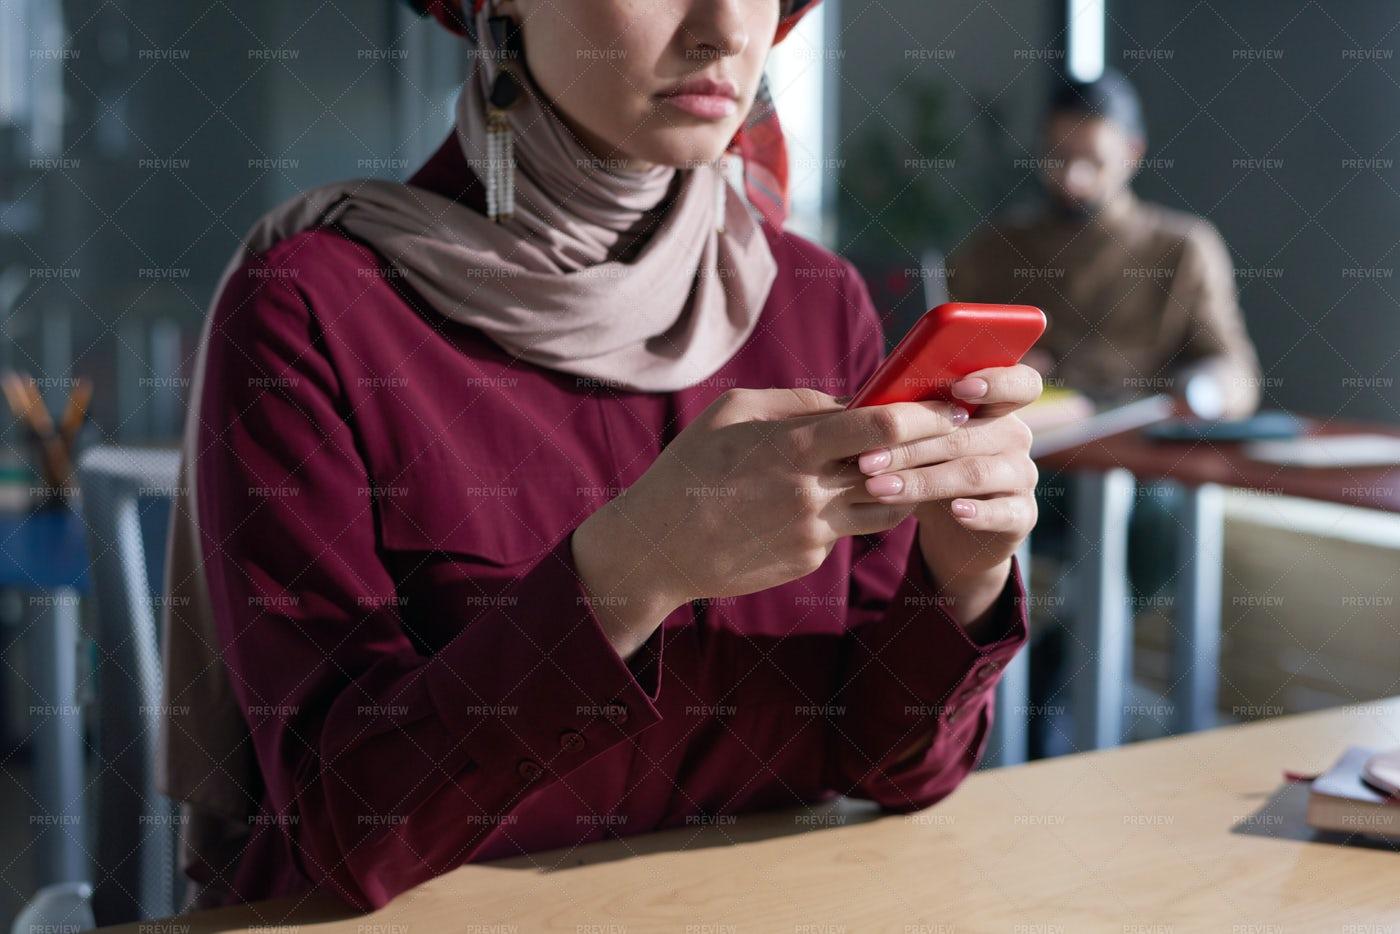 Woman In Hijab Using Phone: Stock Photos